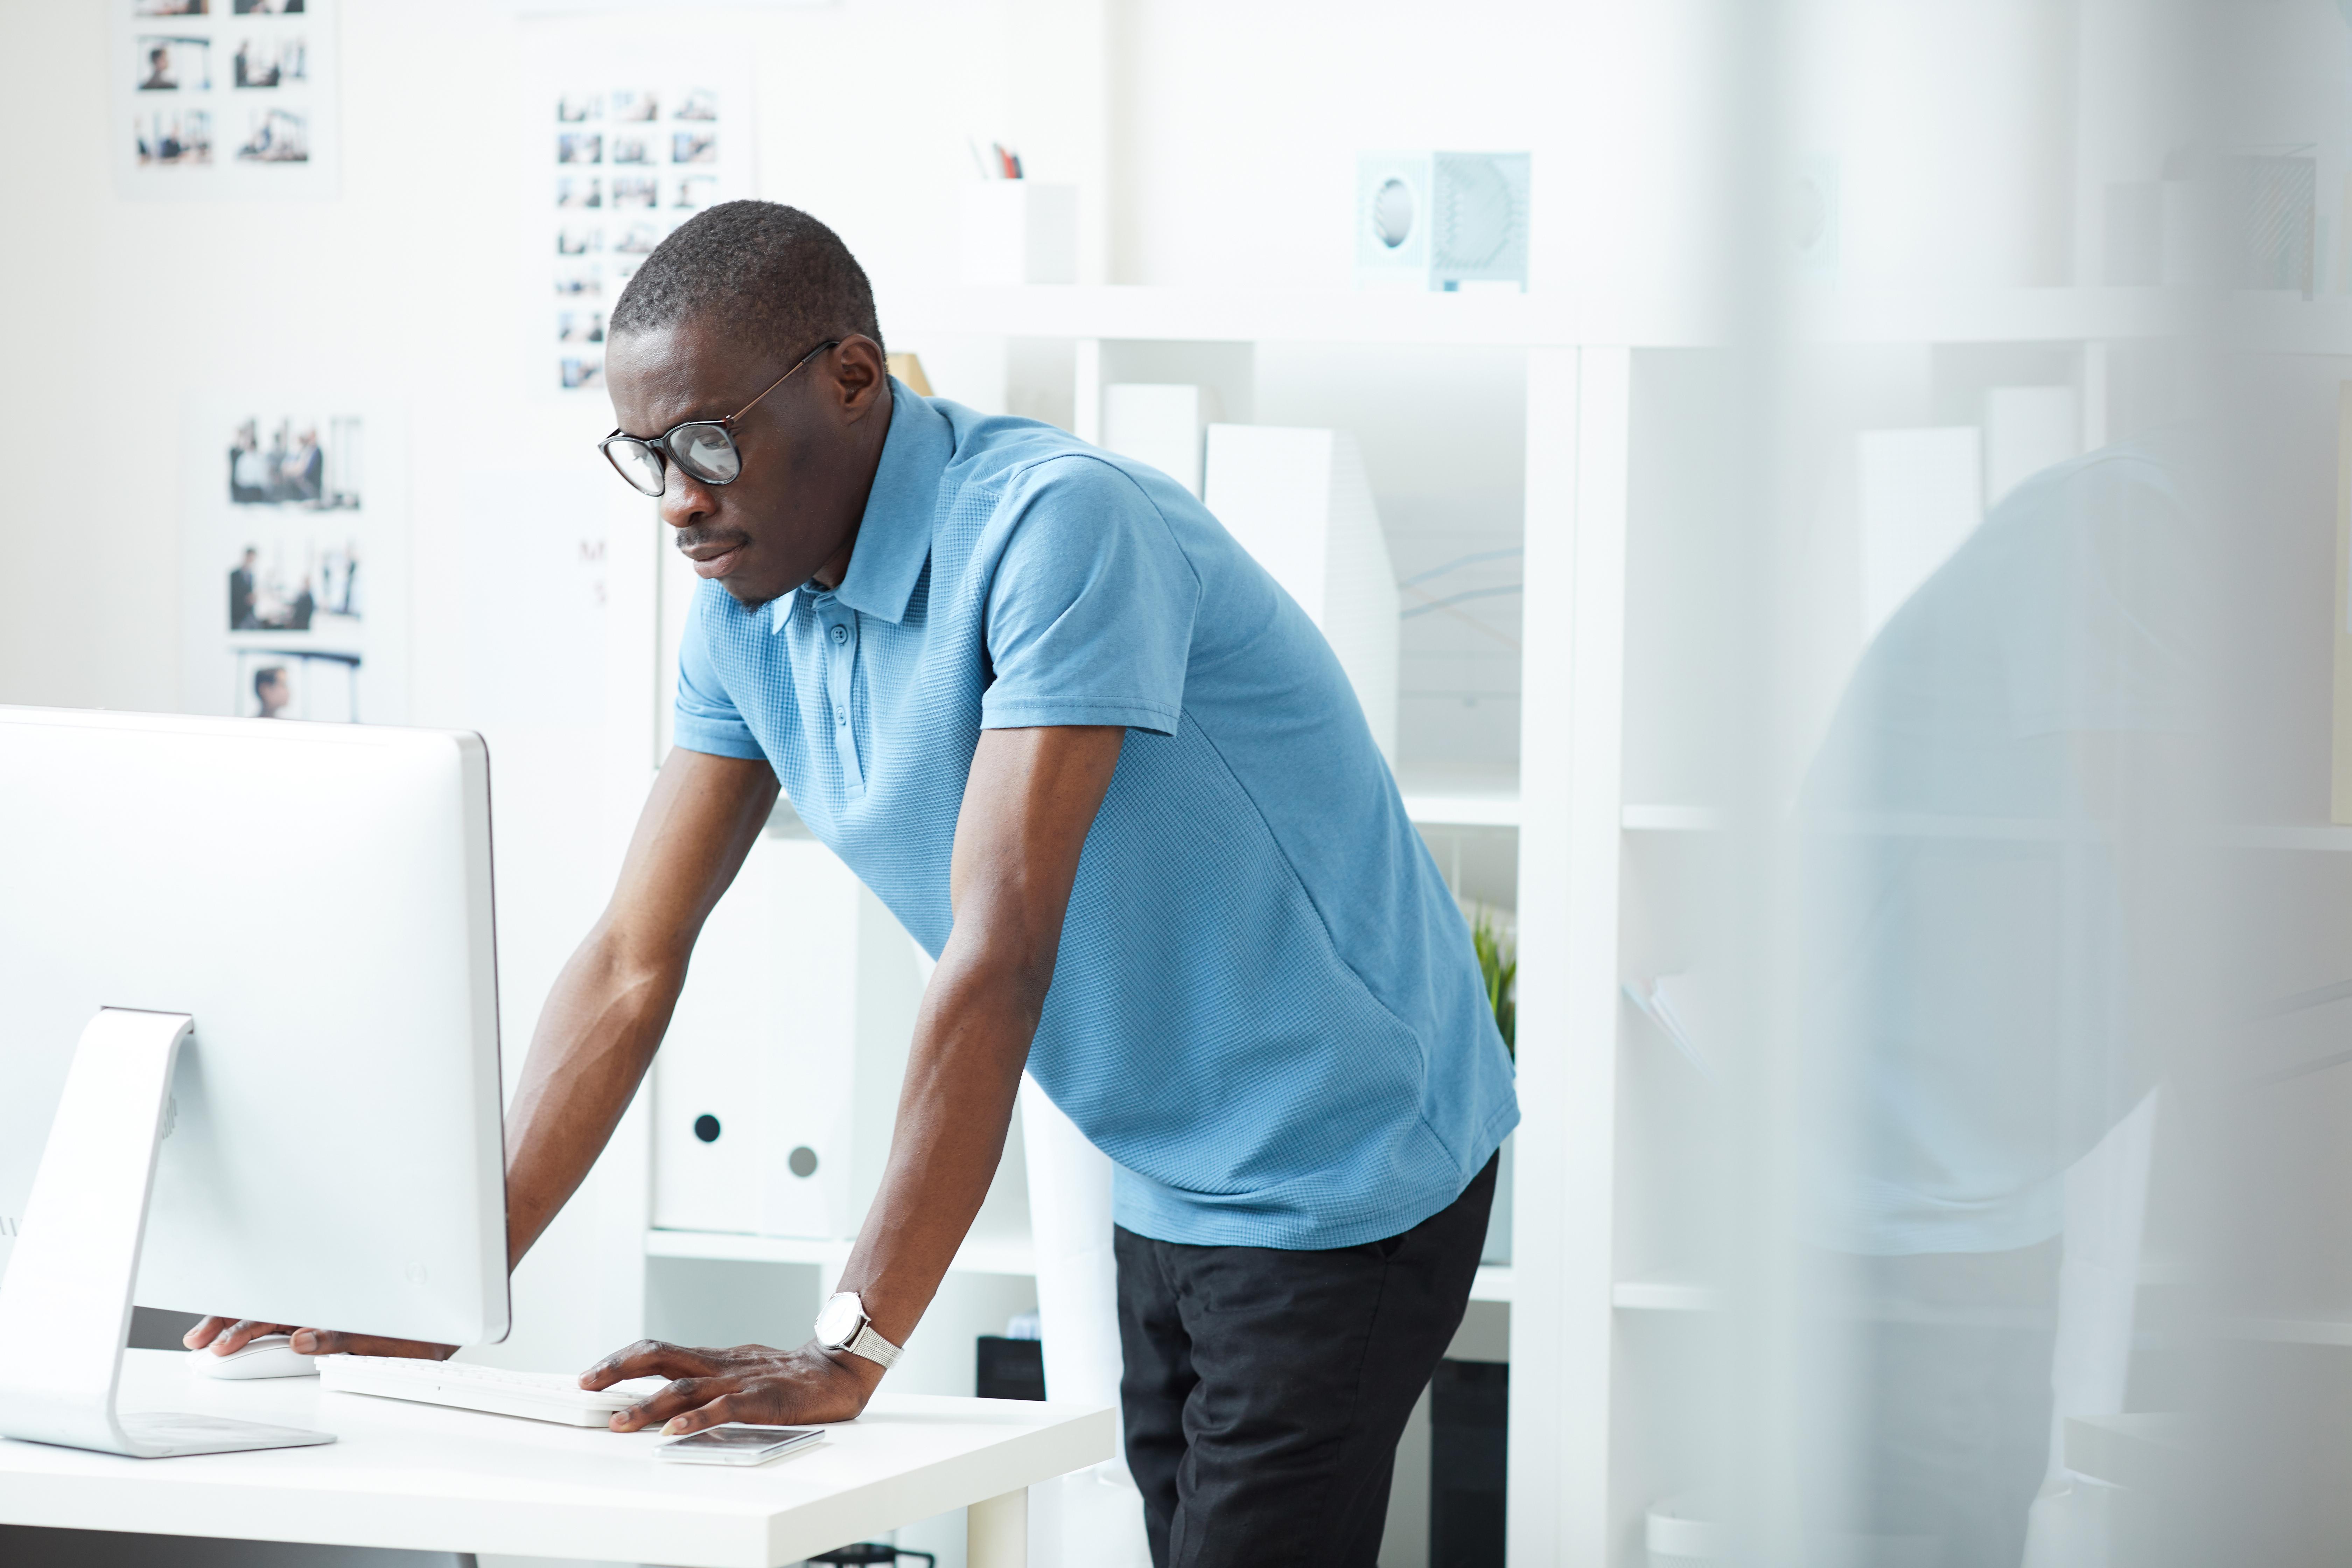 designer-using-computer-in-work-QJJJALD